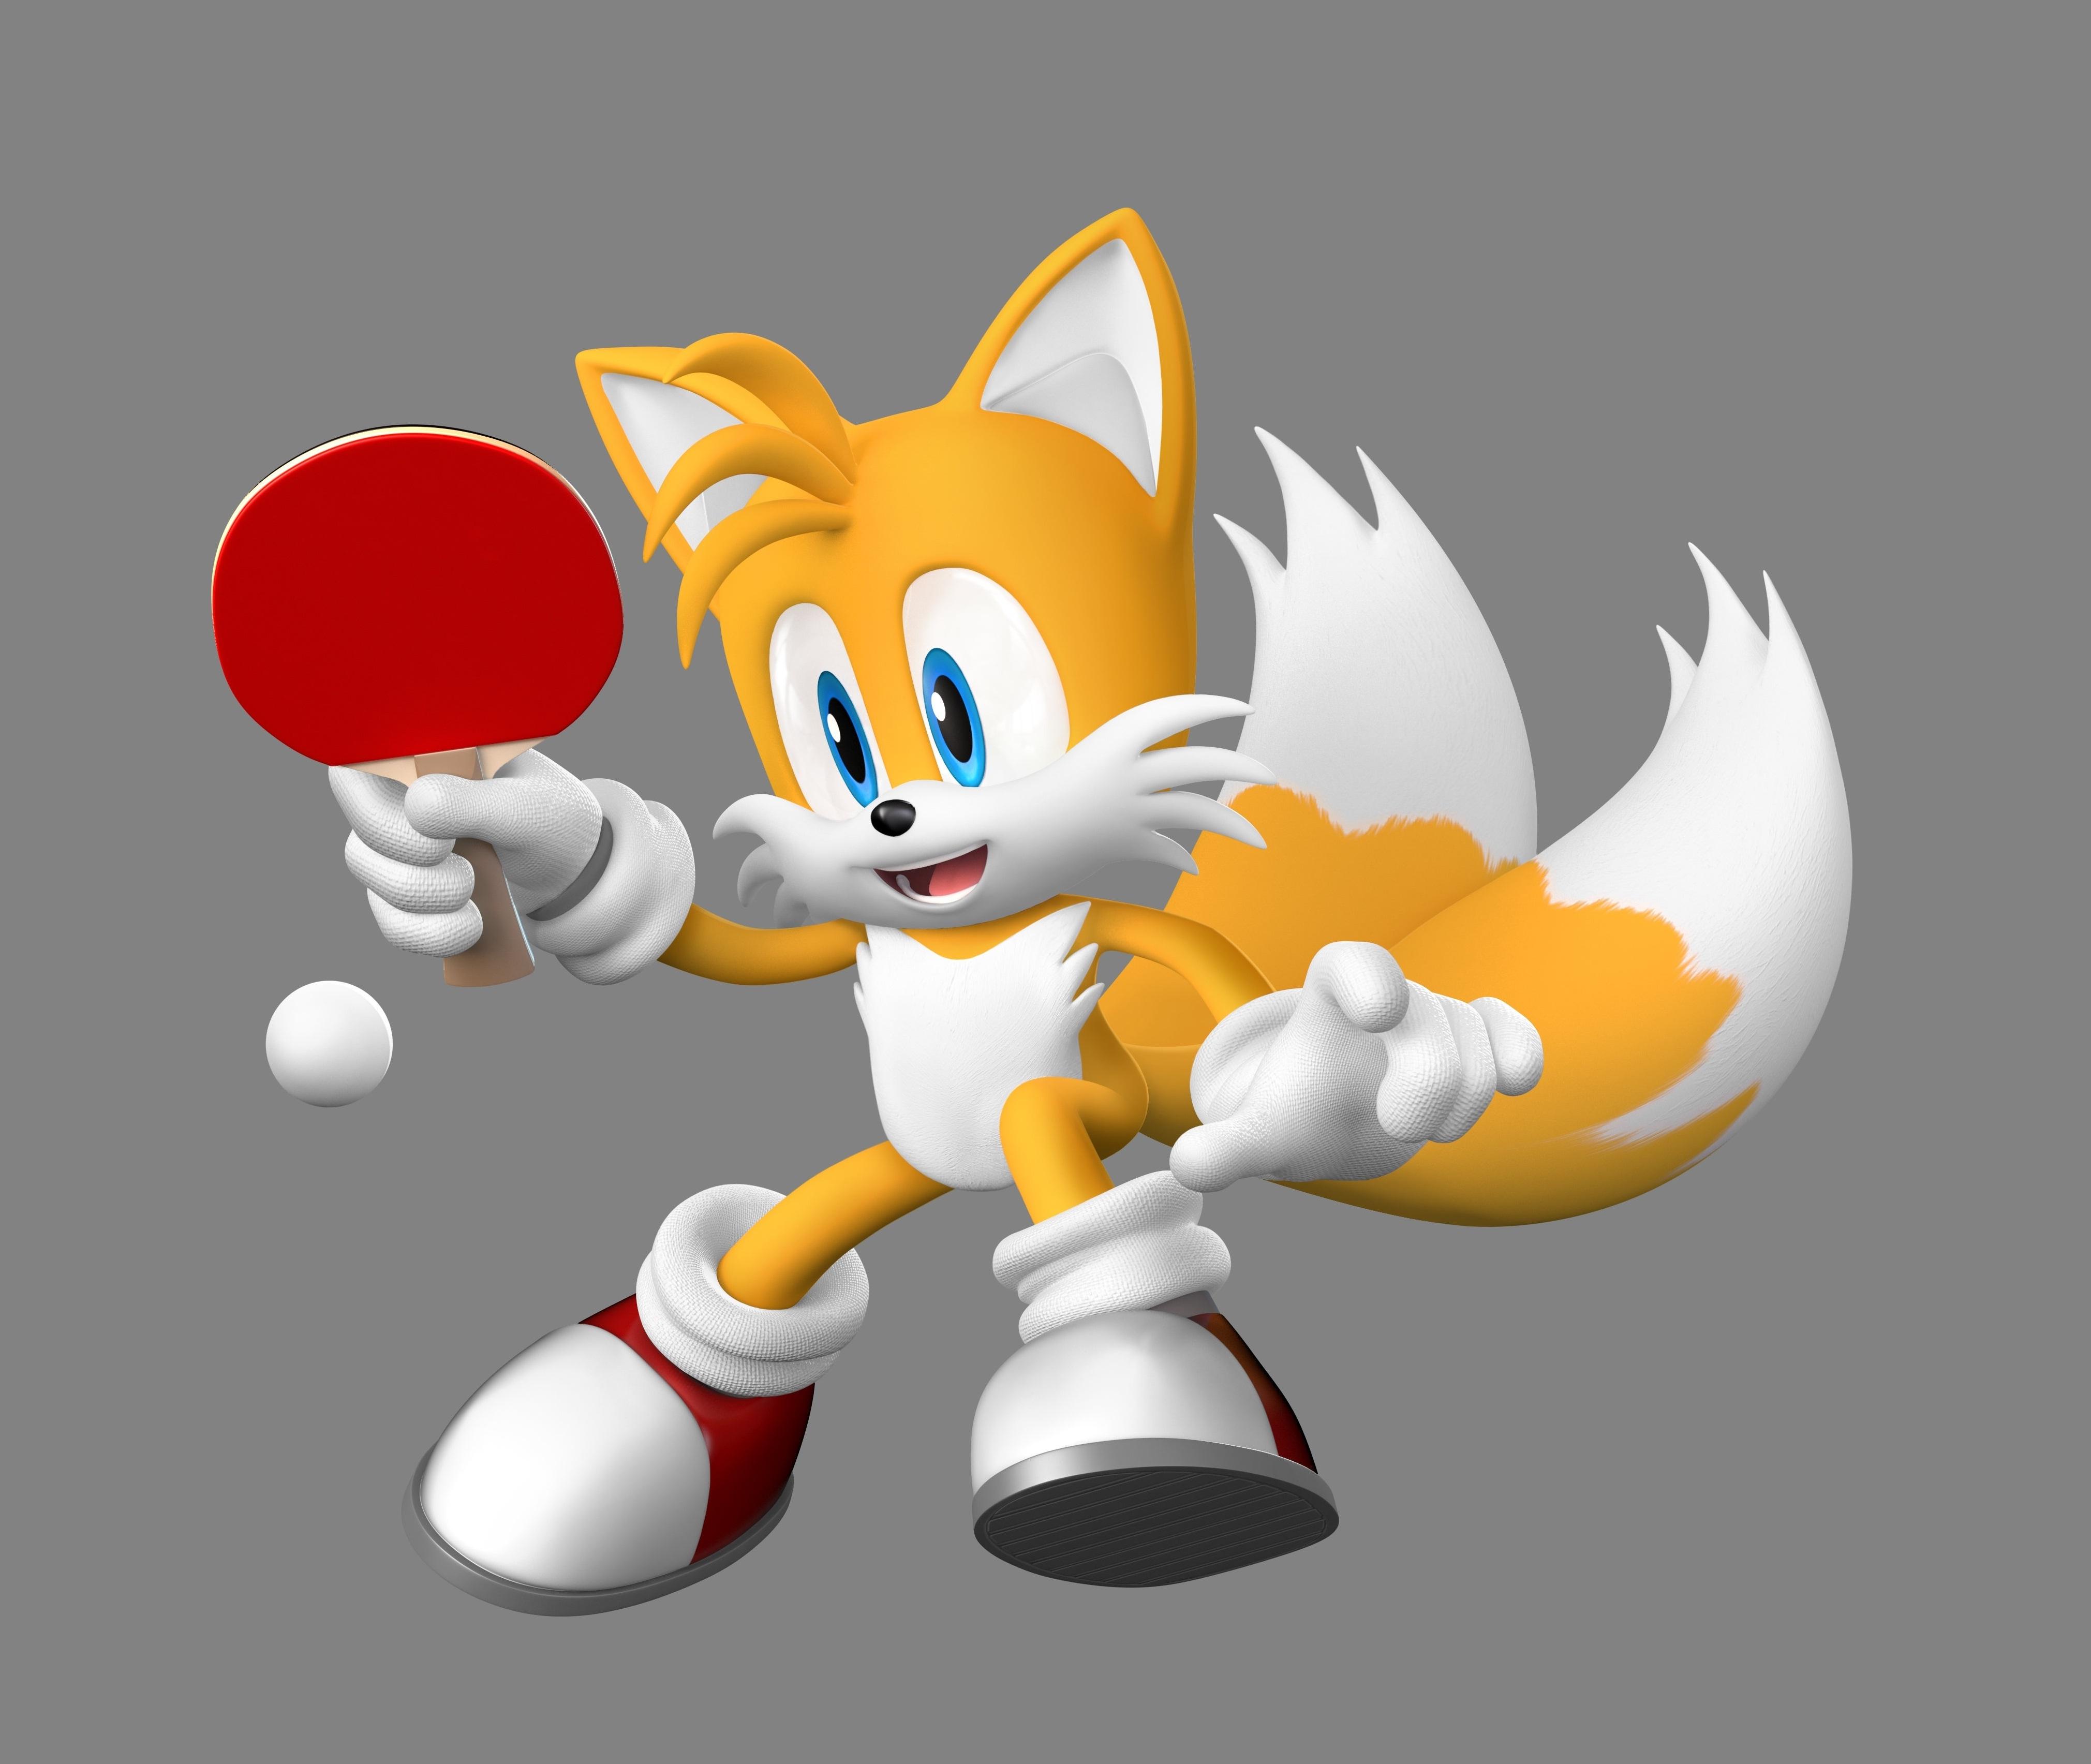 sonic the hedgehog digital - photo #29